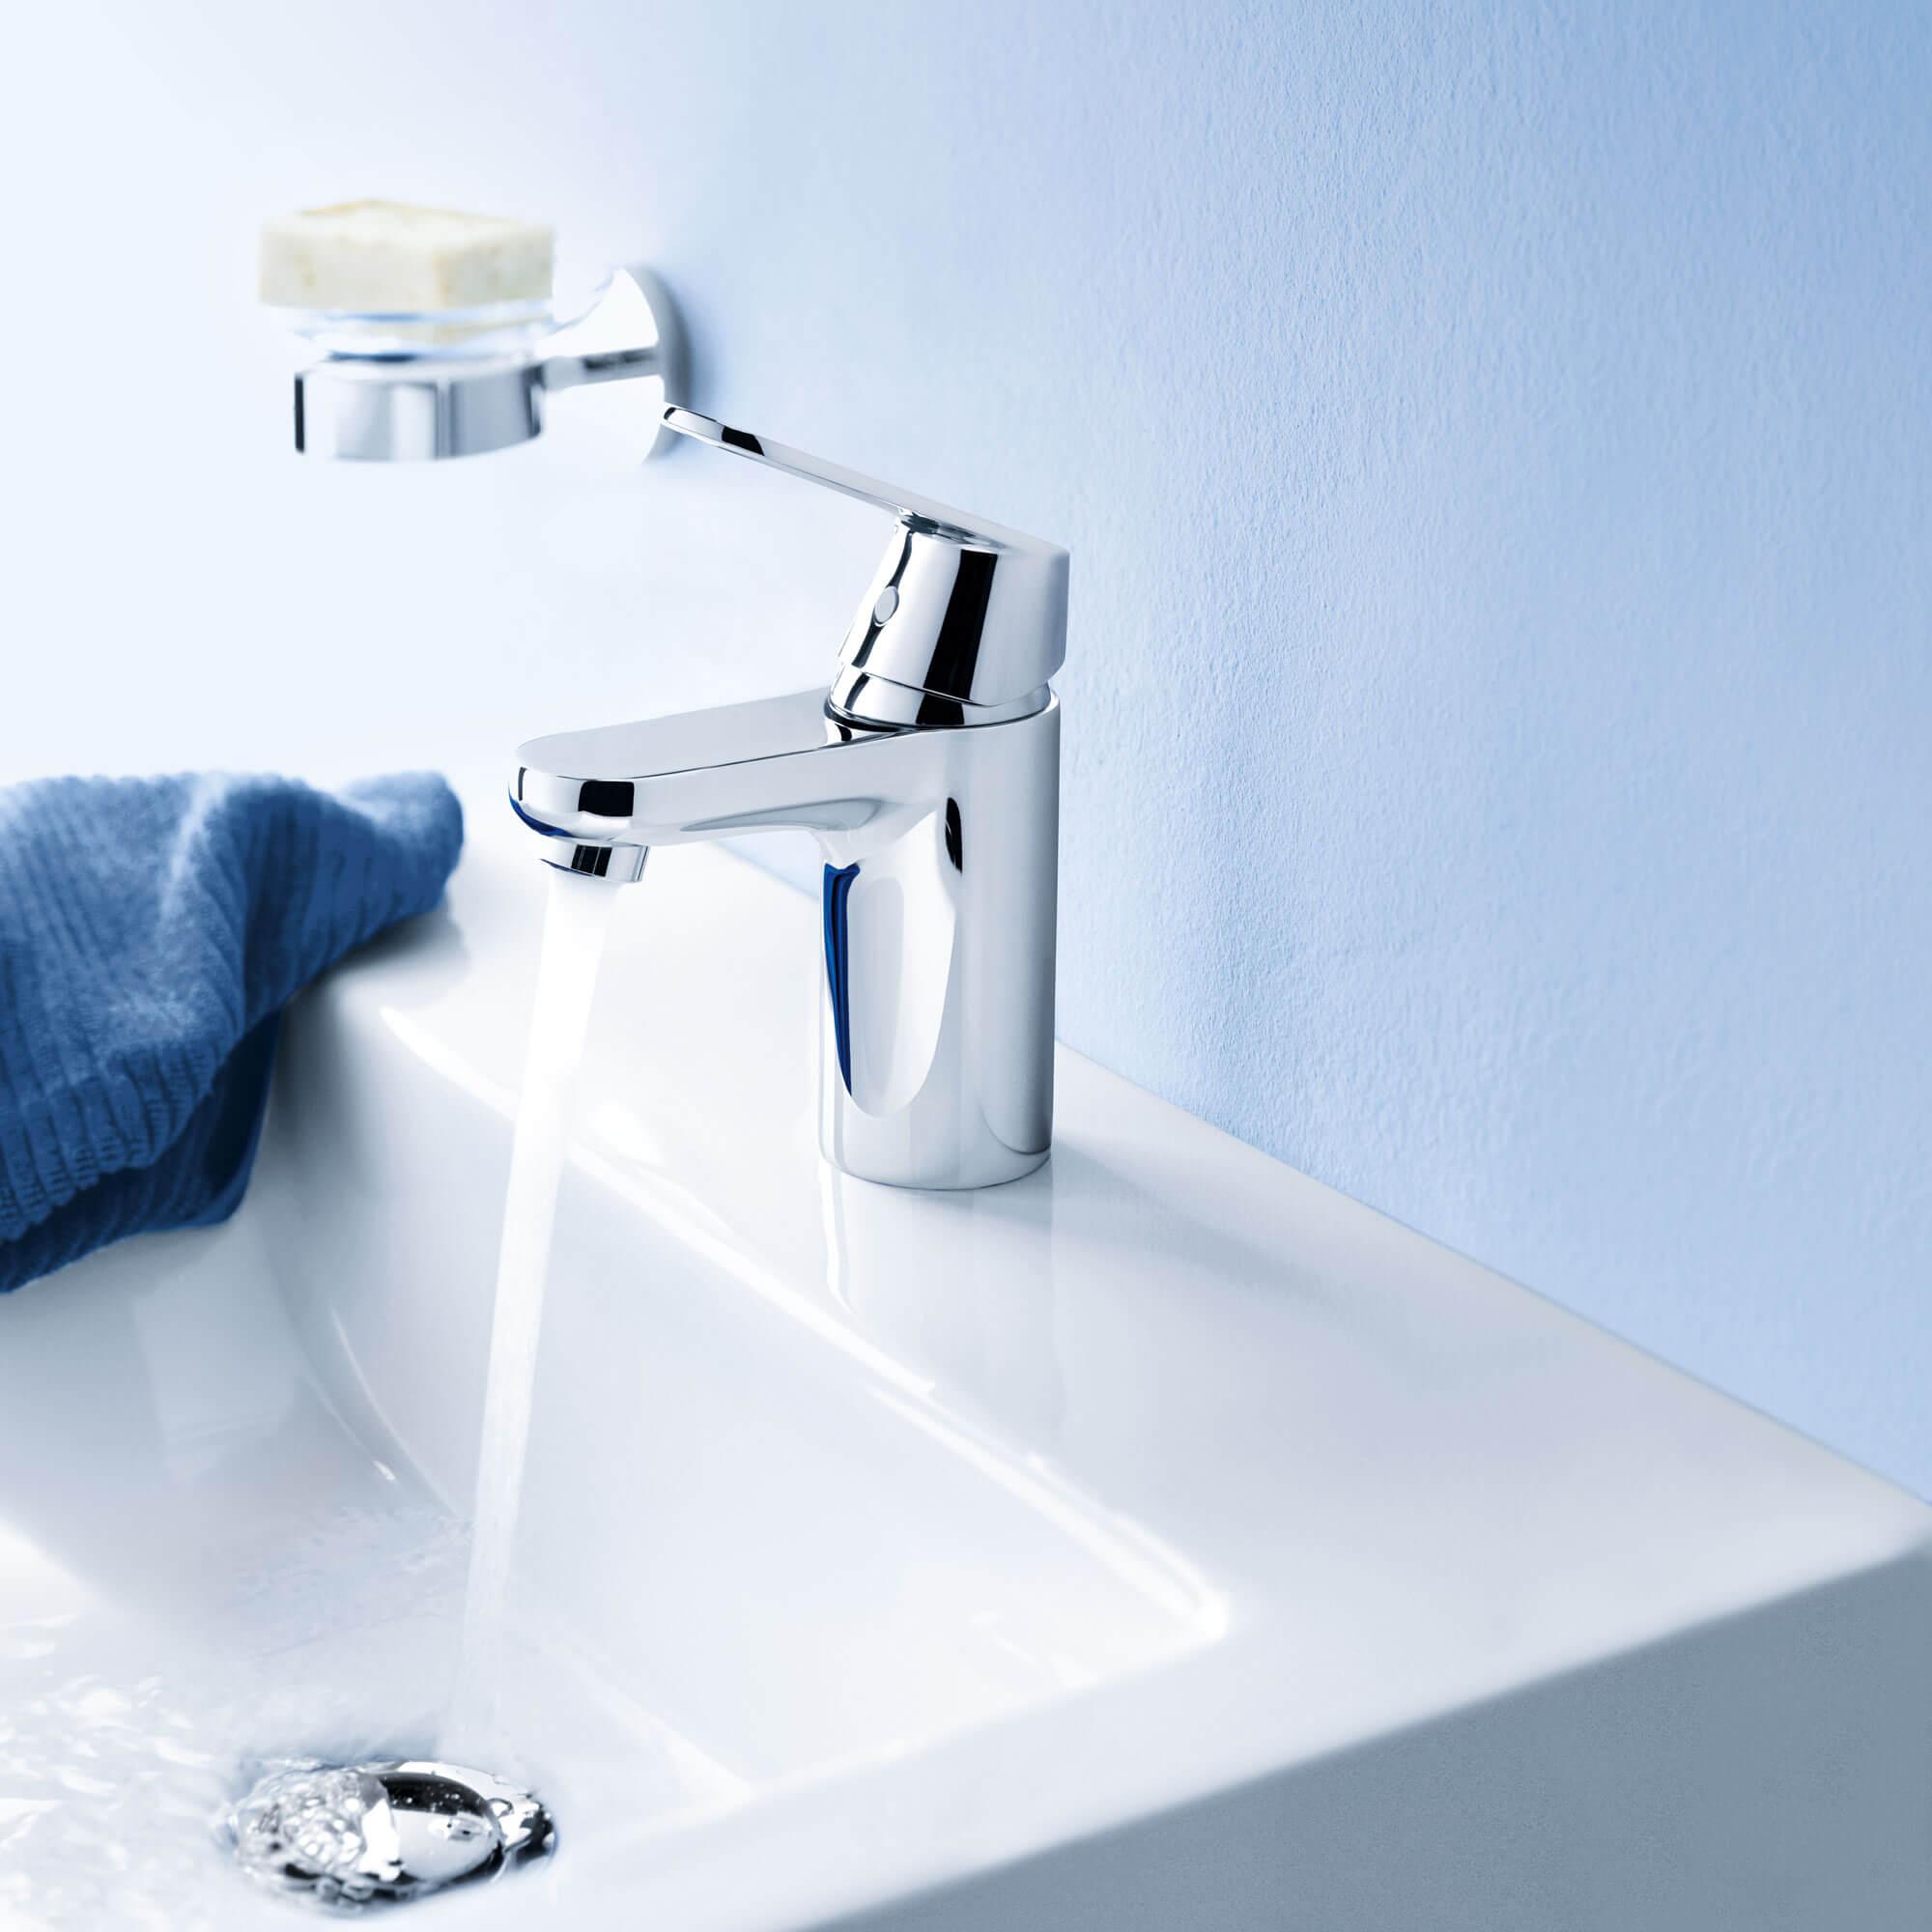 Grohe couler dans une salle de bain bleu clair.